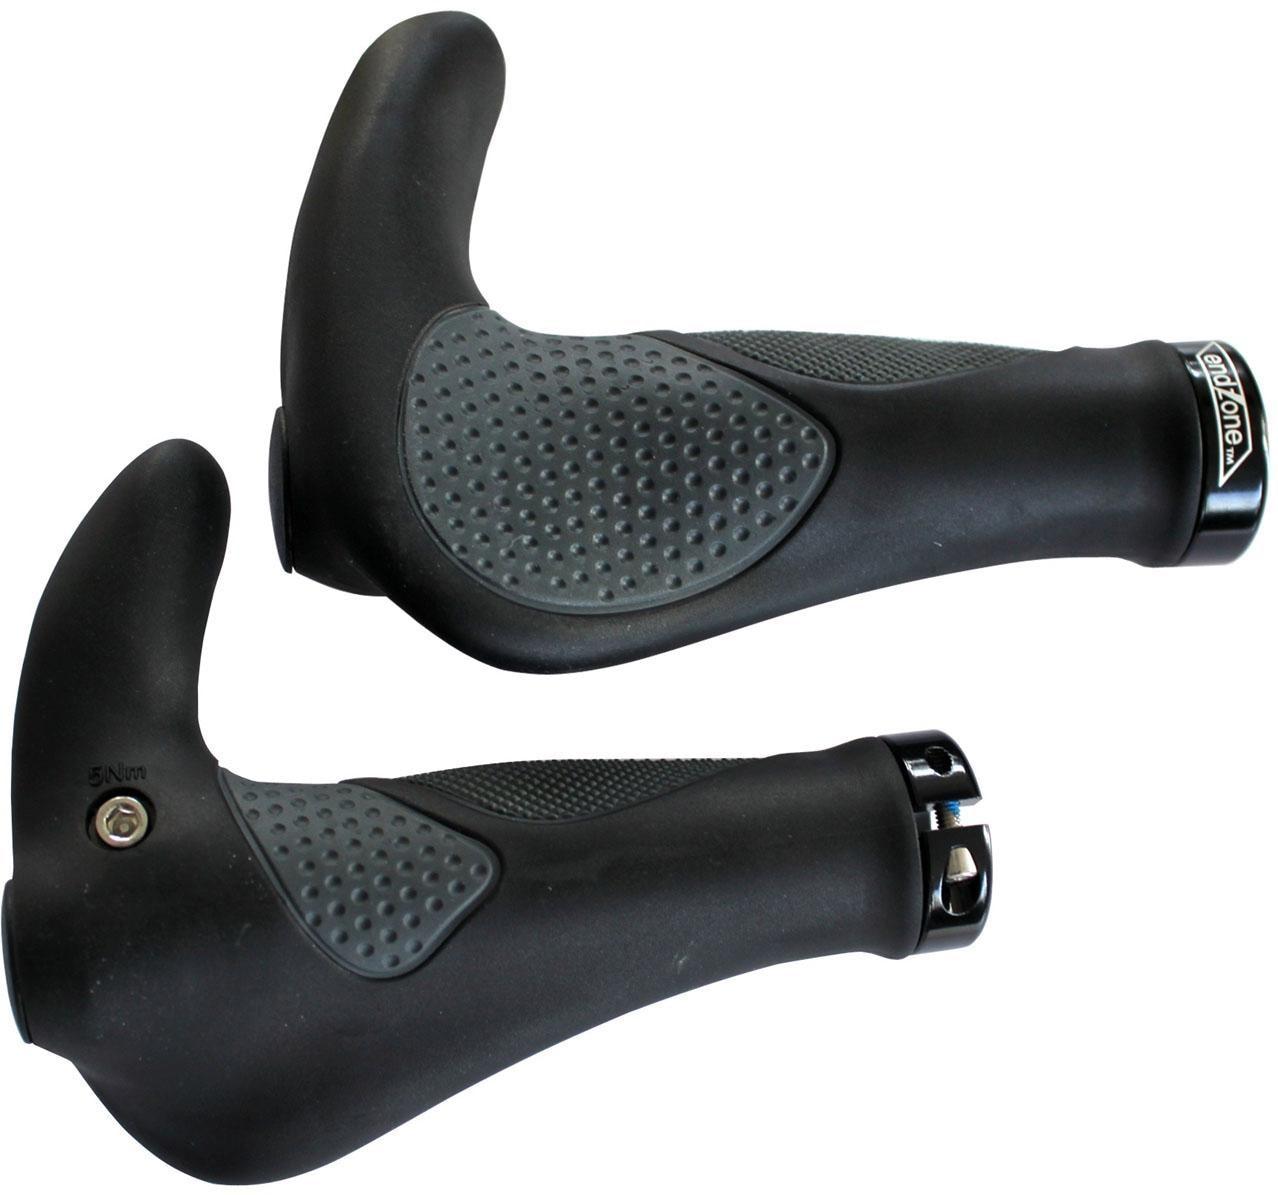 Point Fahrradlenkergriff AD 3 (2-tlg., Paar) grau Fahrradteile Fahrradzubehör Fahrräder Zubehör Lenkergriffe